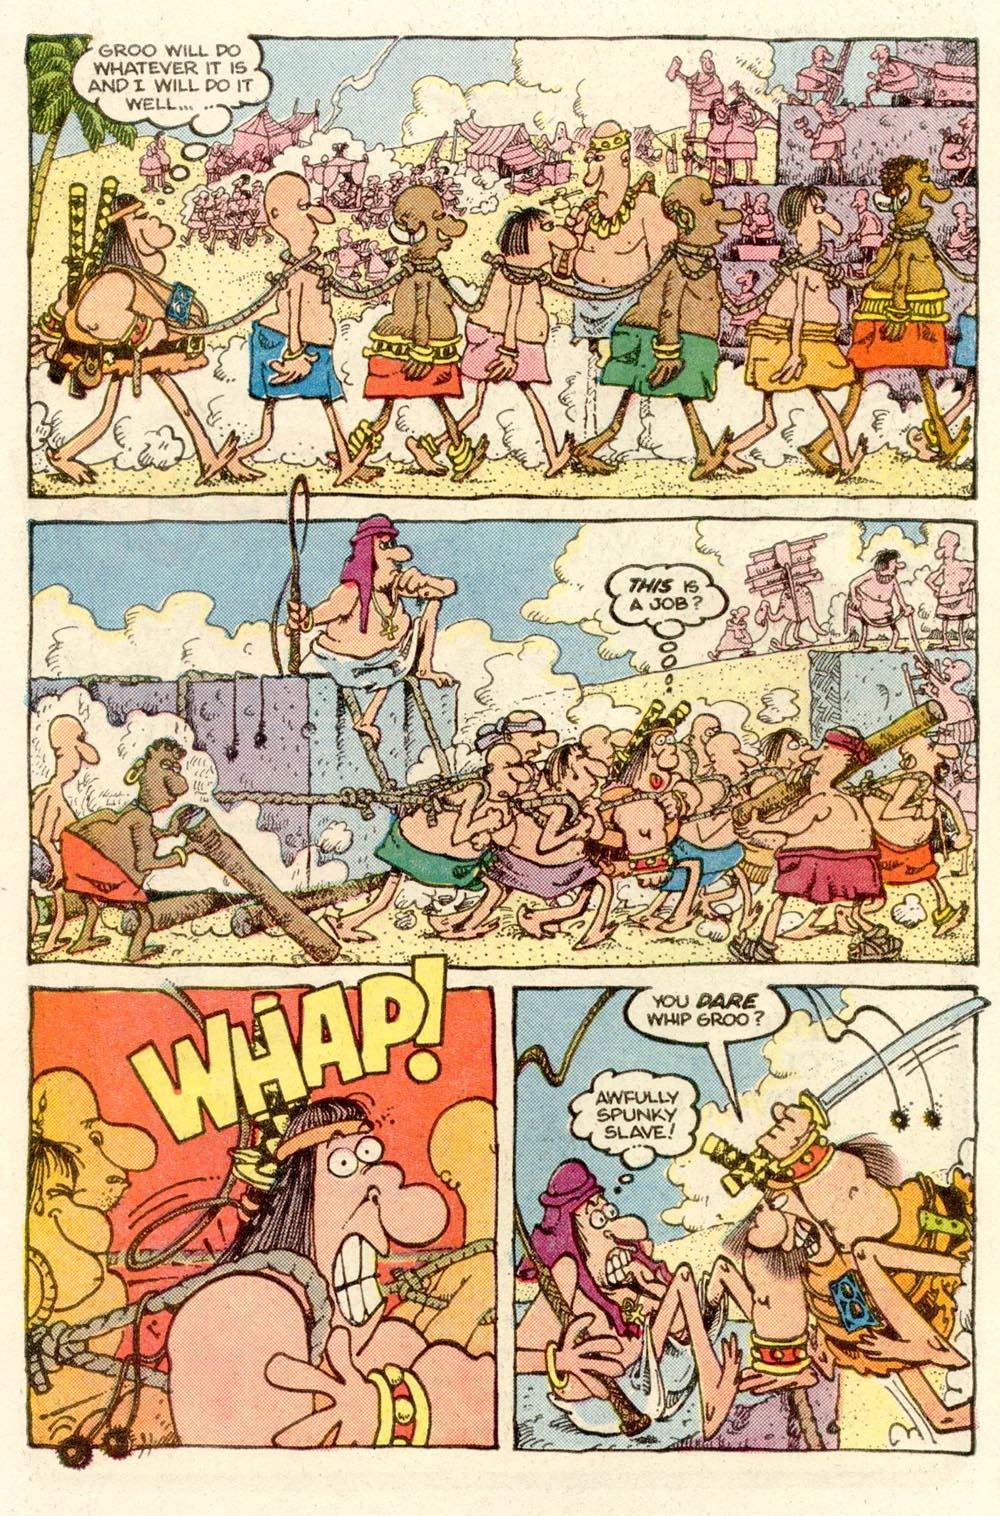 Read online Sergio Aragonés Groo the Wanderer comic -  Issue #14 - 6